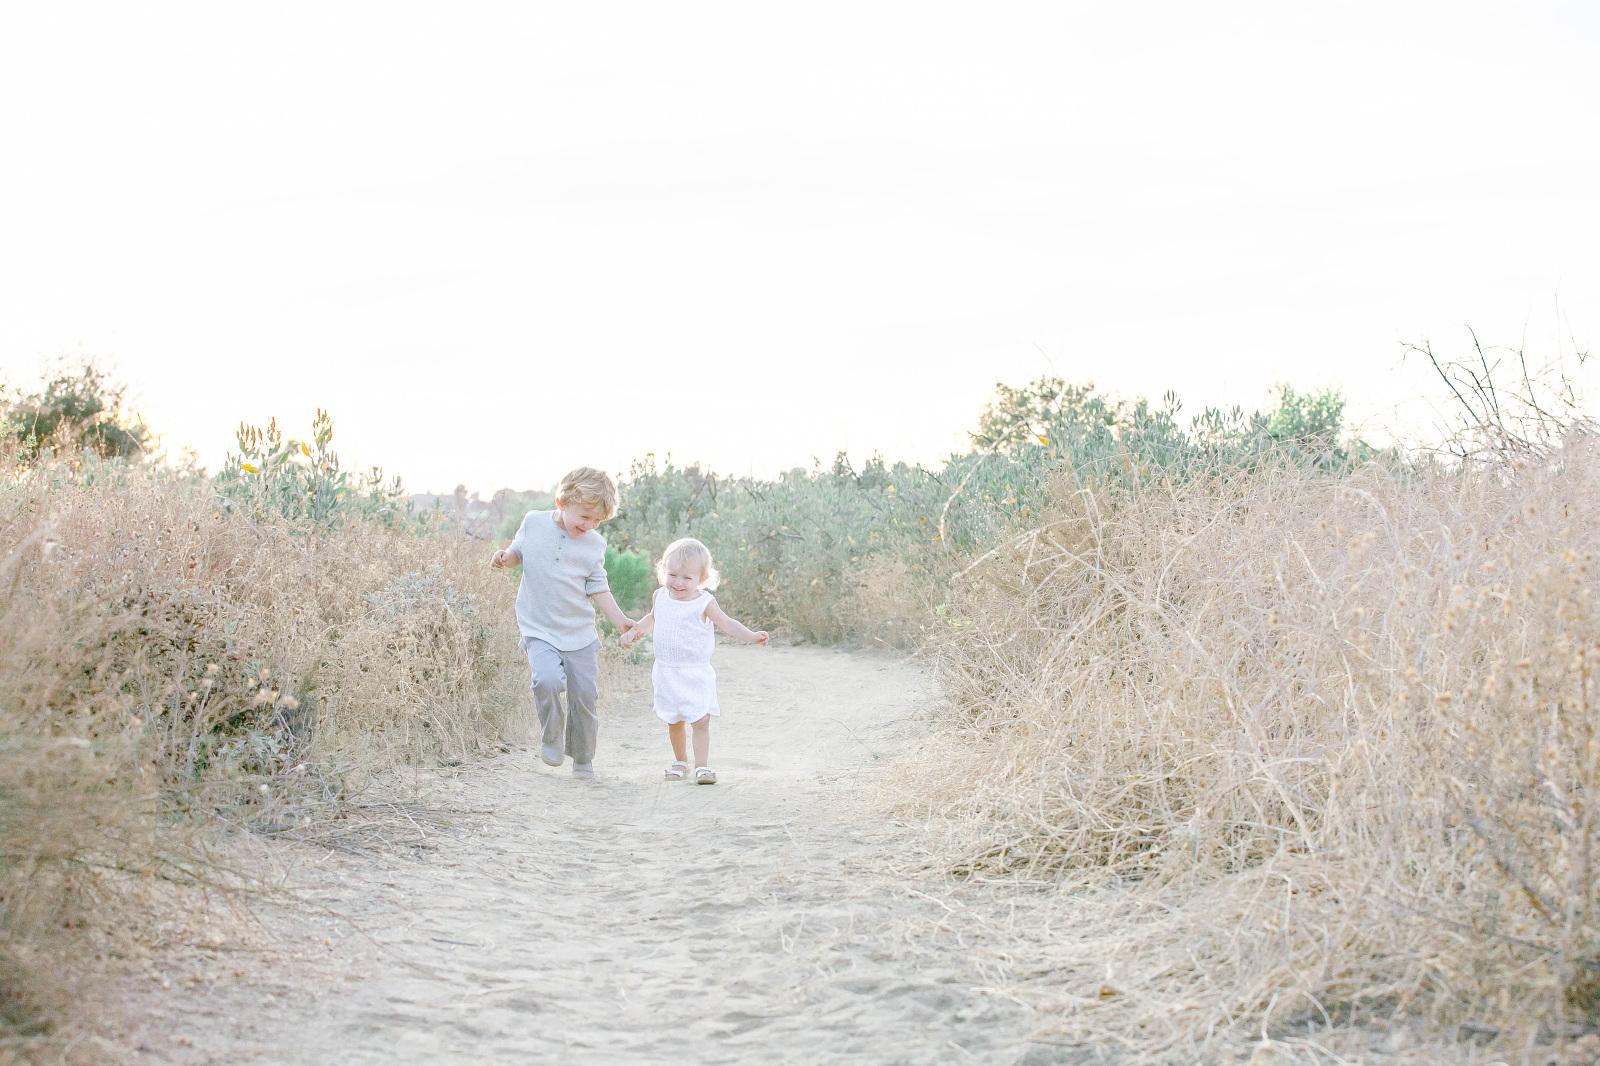 Orange-County-Newborn-Photographer-Outdoor-Family-Session